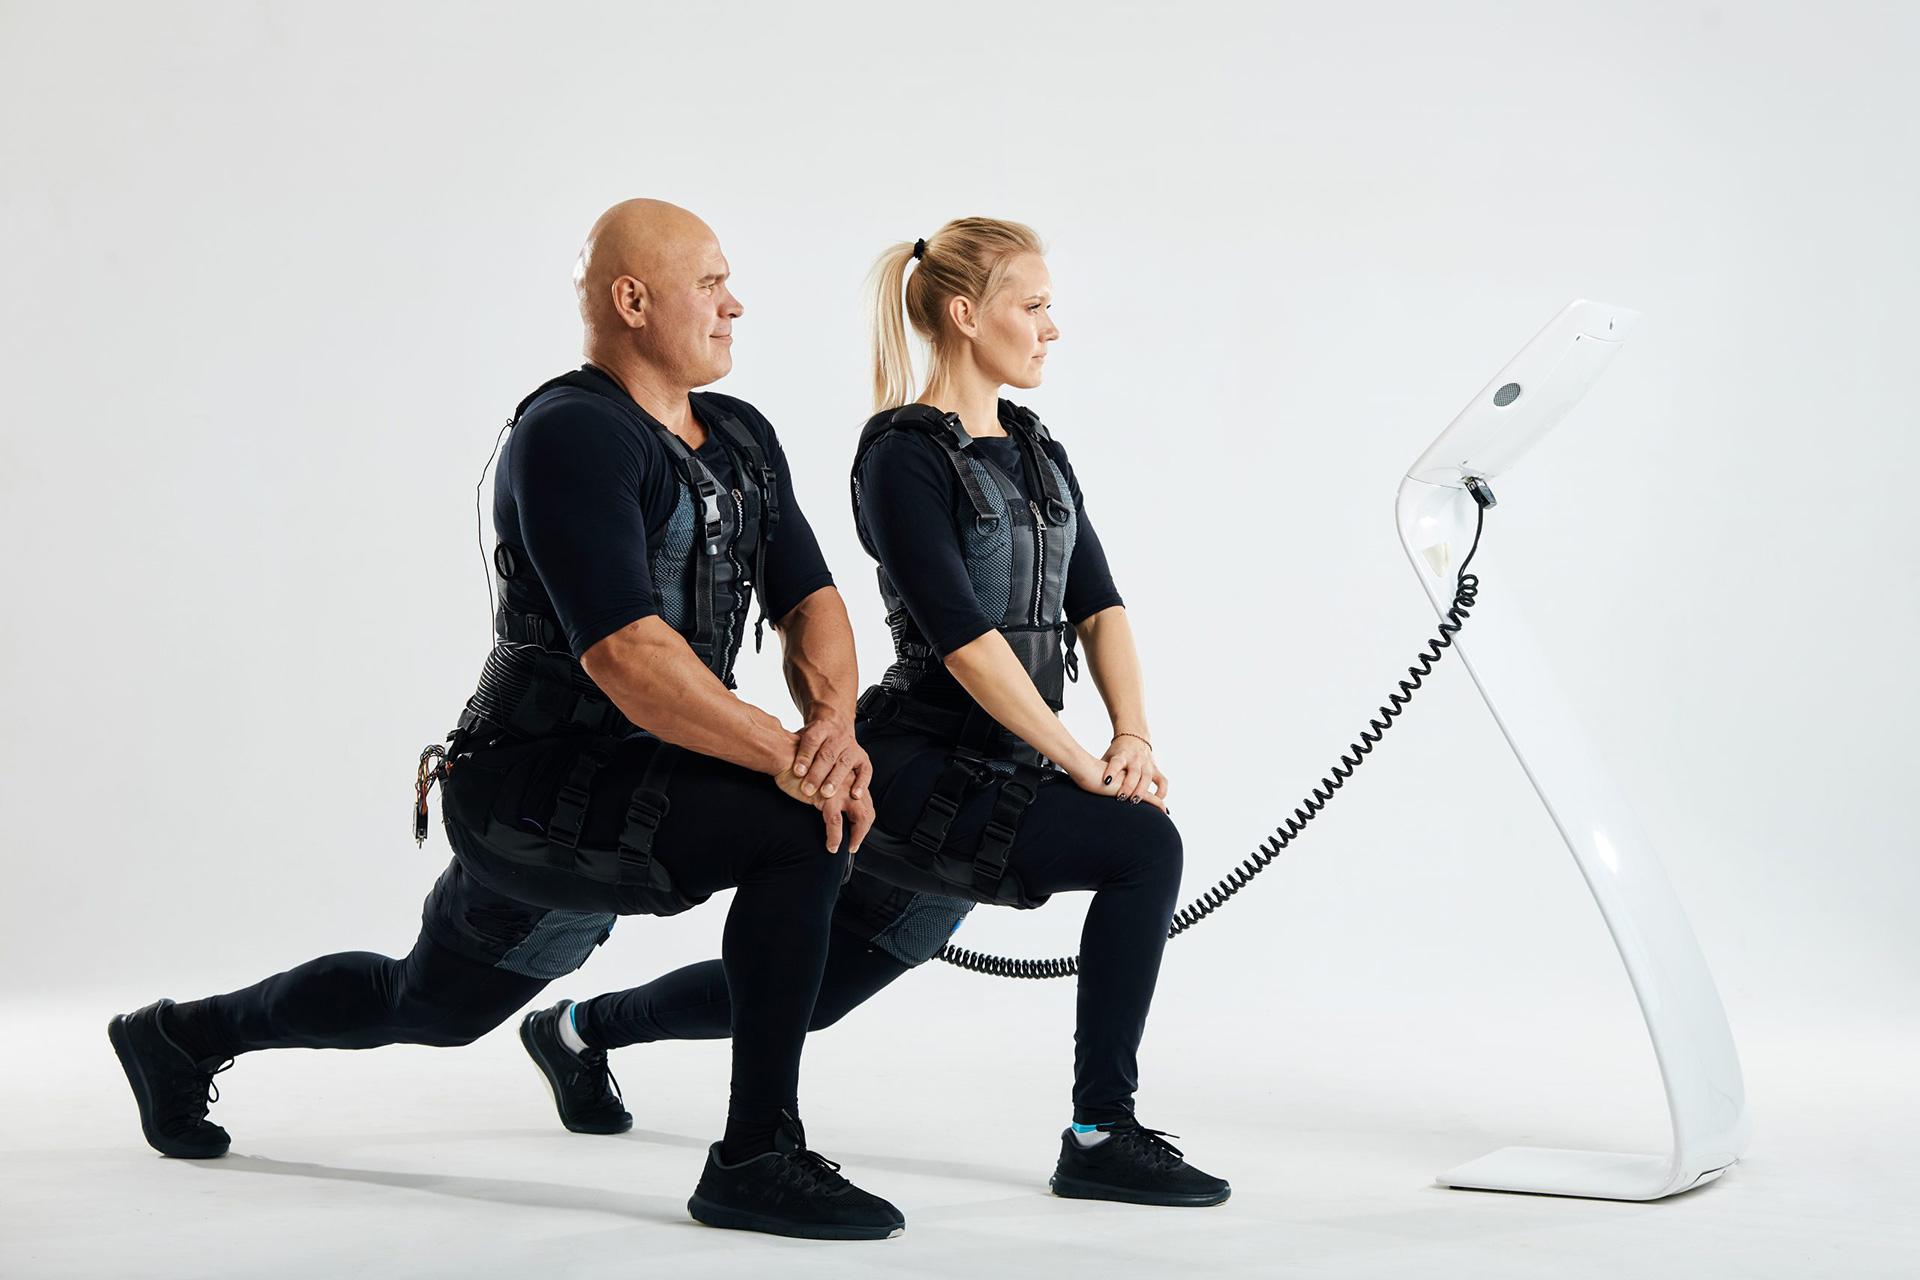 EMS Improves Quadriceps Muscle Strength